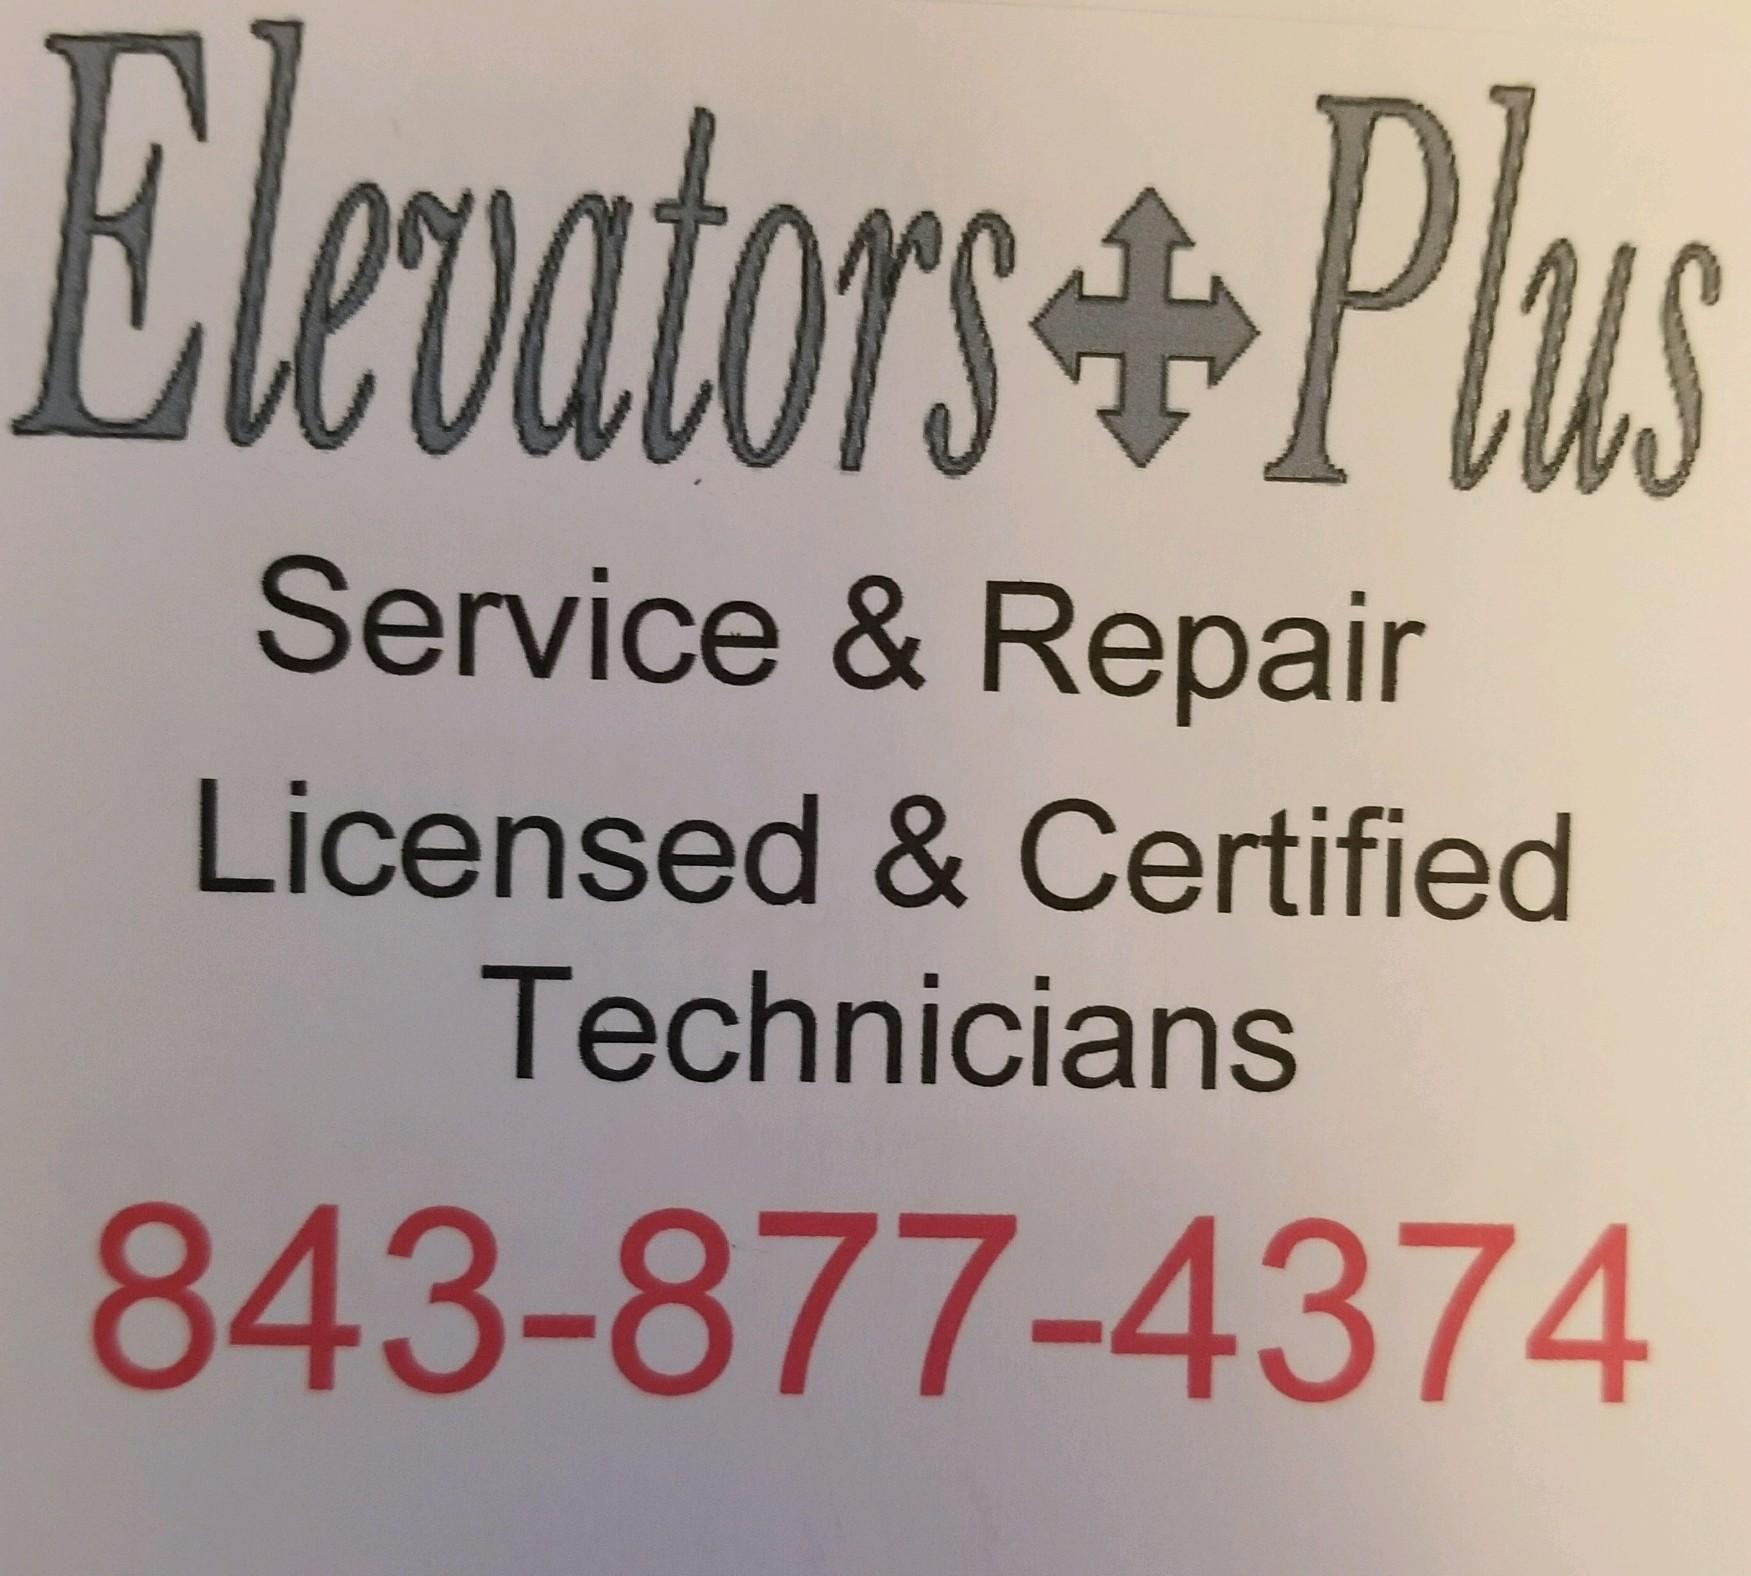 Elevators Plus LLC